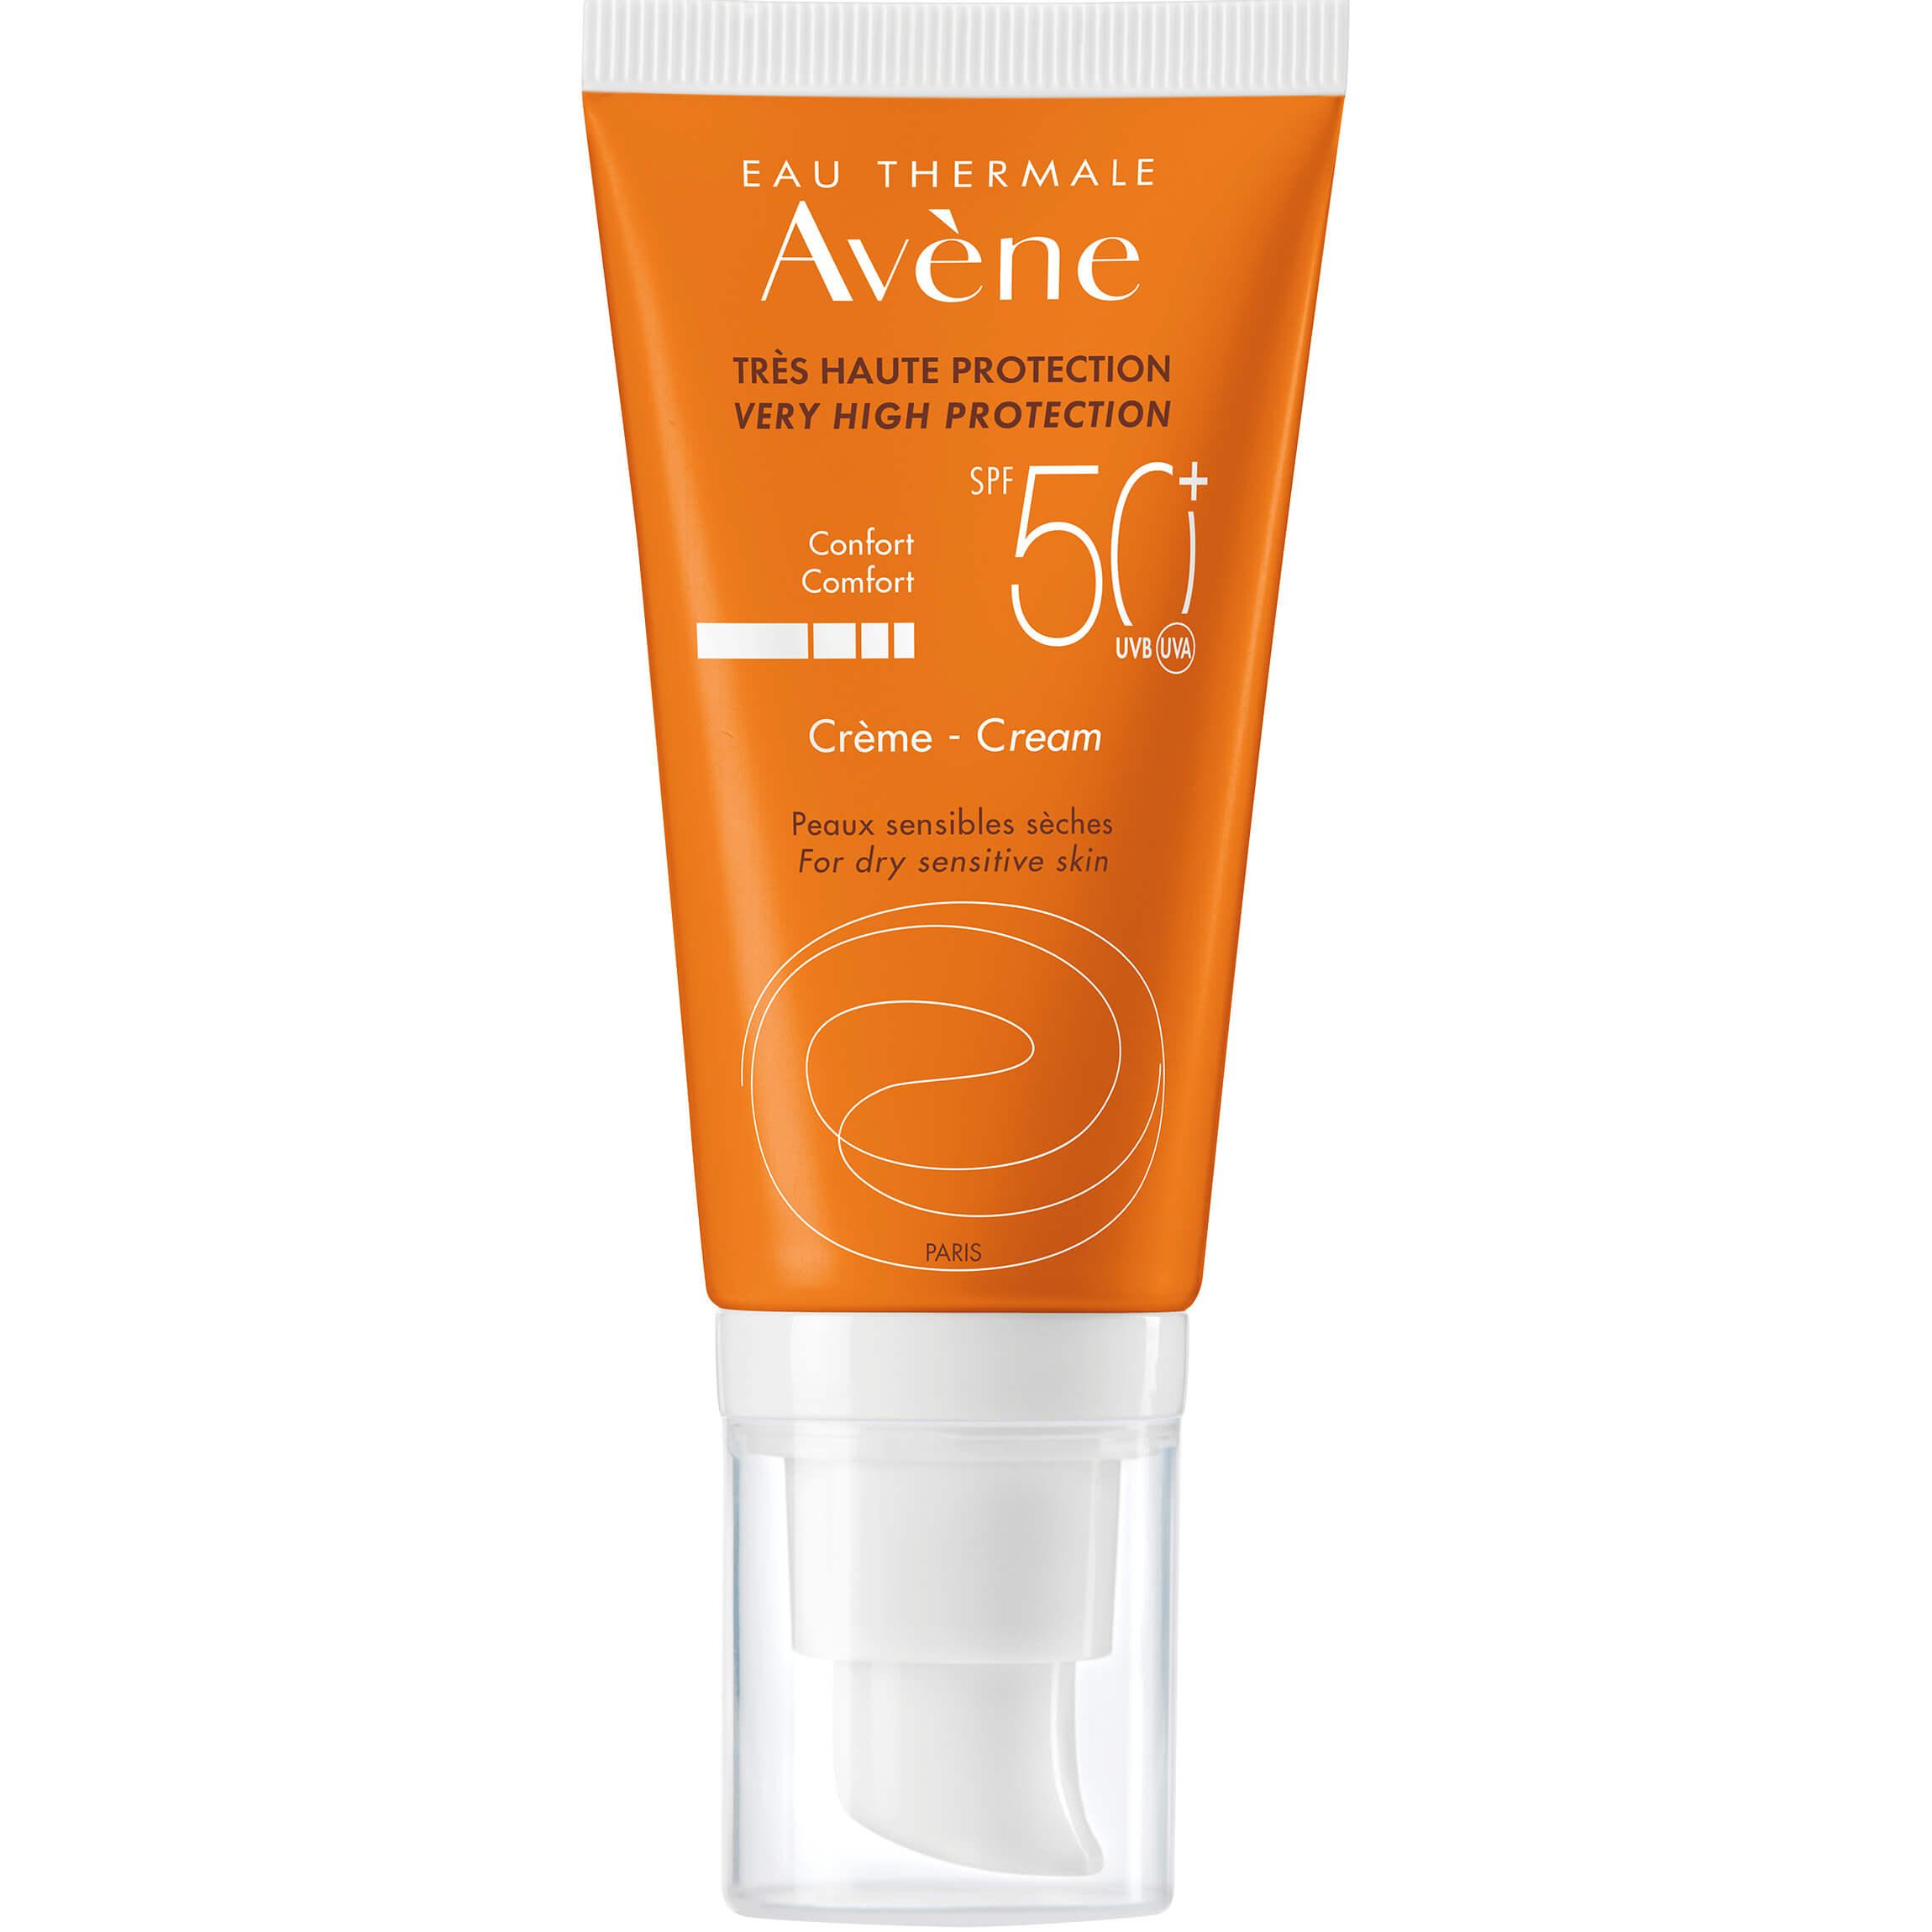 Avene Creme Comfort Spf50+ Αντηλιακή Κρέμα Προσώπου Πολύ Υψηλής Προστασίας για Ξηρή – Ευαίσθητη Επιδερμίδα50ml